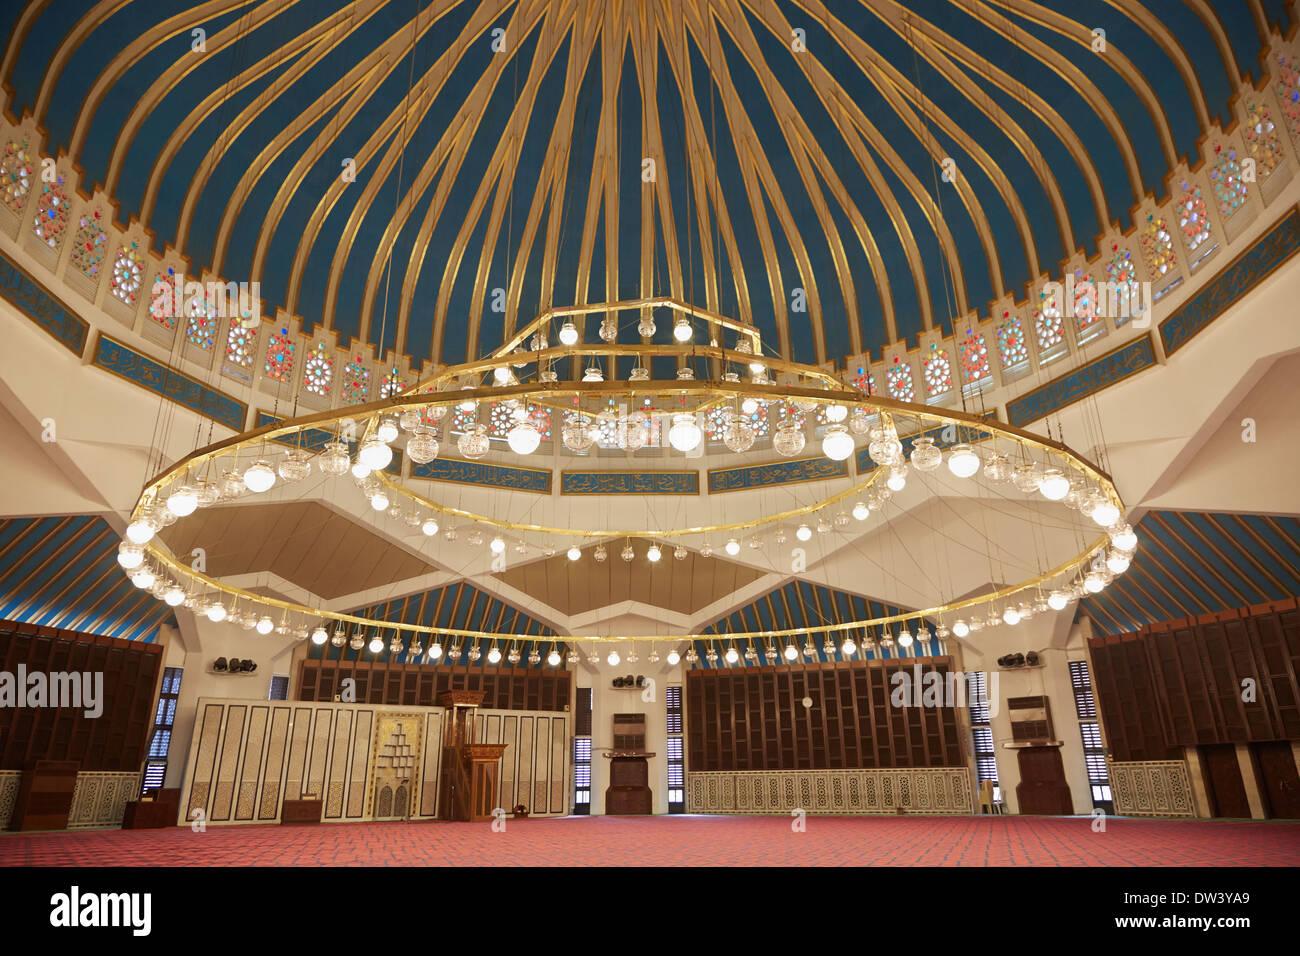 King Abdullah I Mosque Interior In Amman Jordan